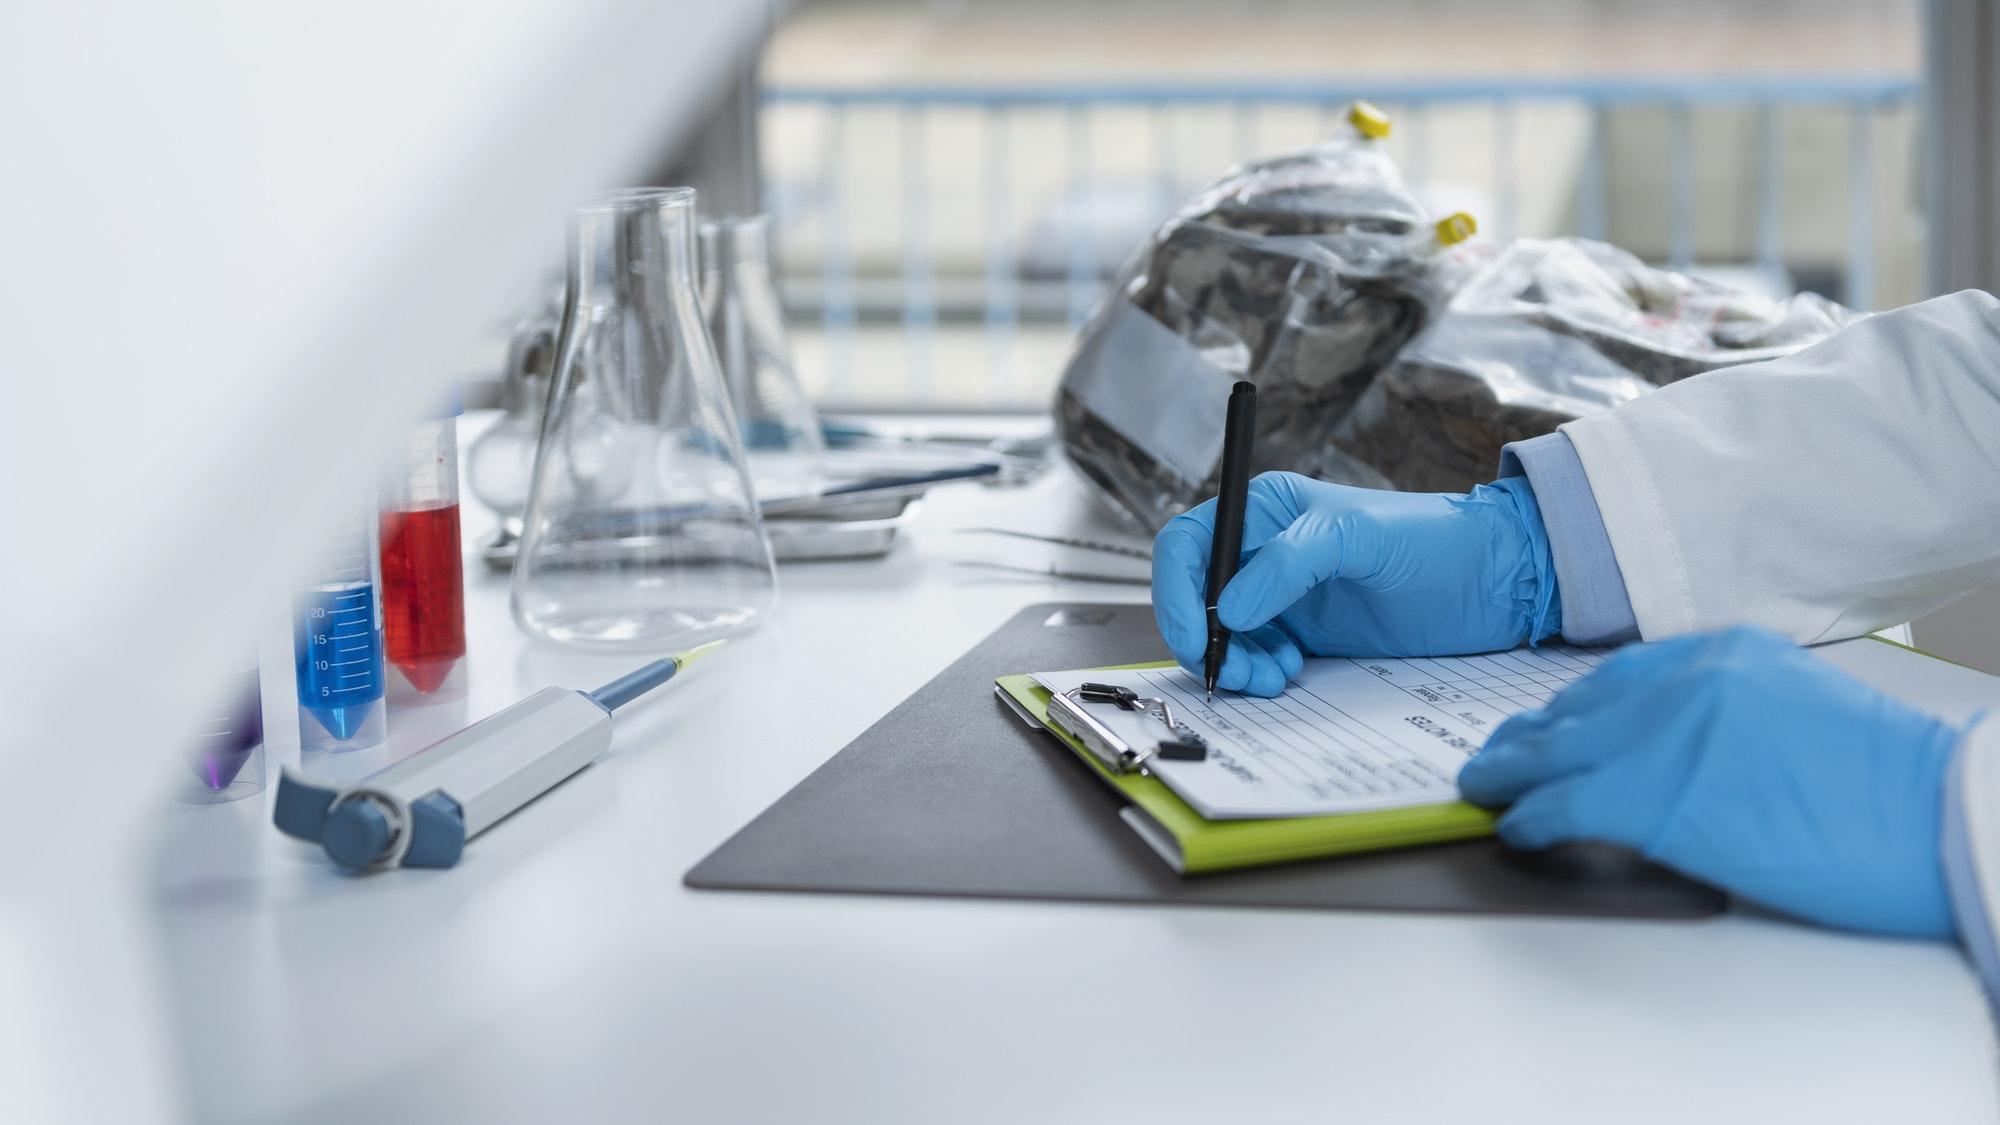 Organic Certification Laboratory. Filling a Form for Organic Certification Procedure